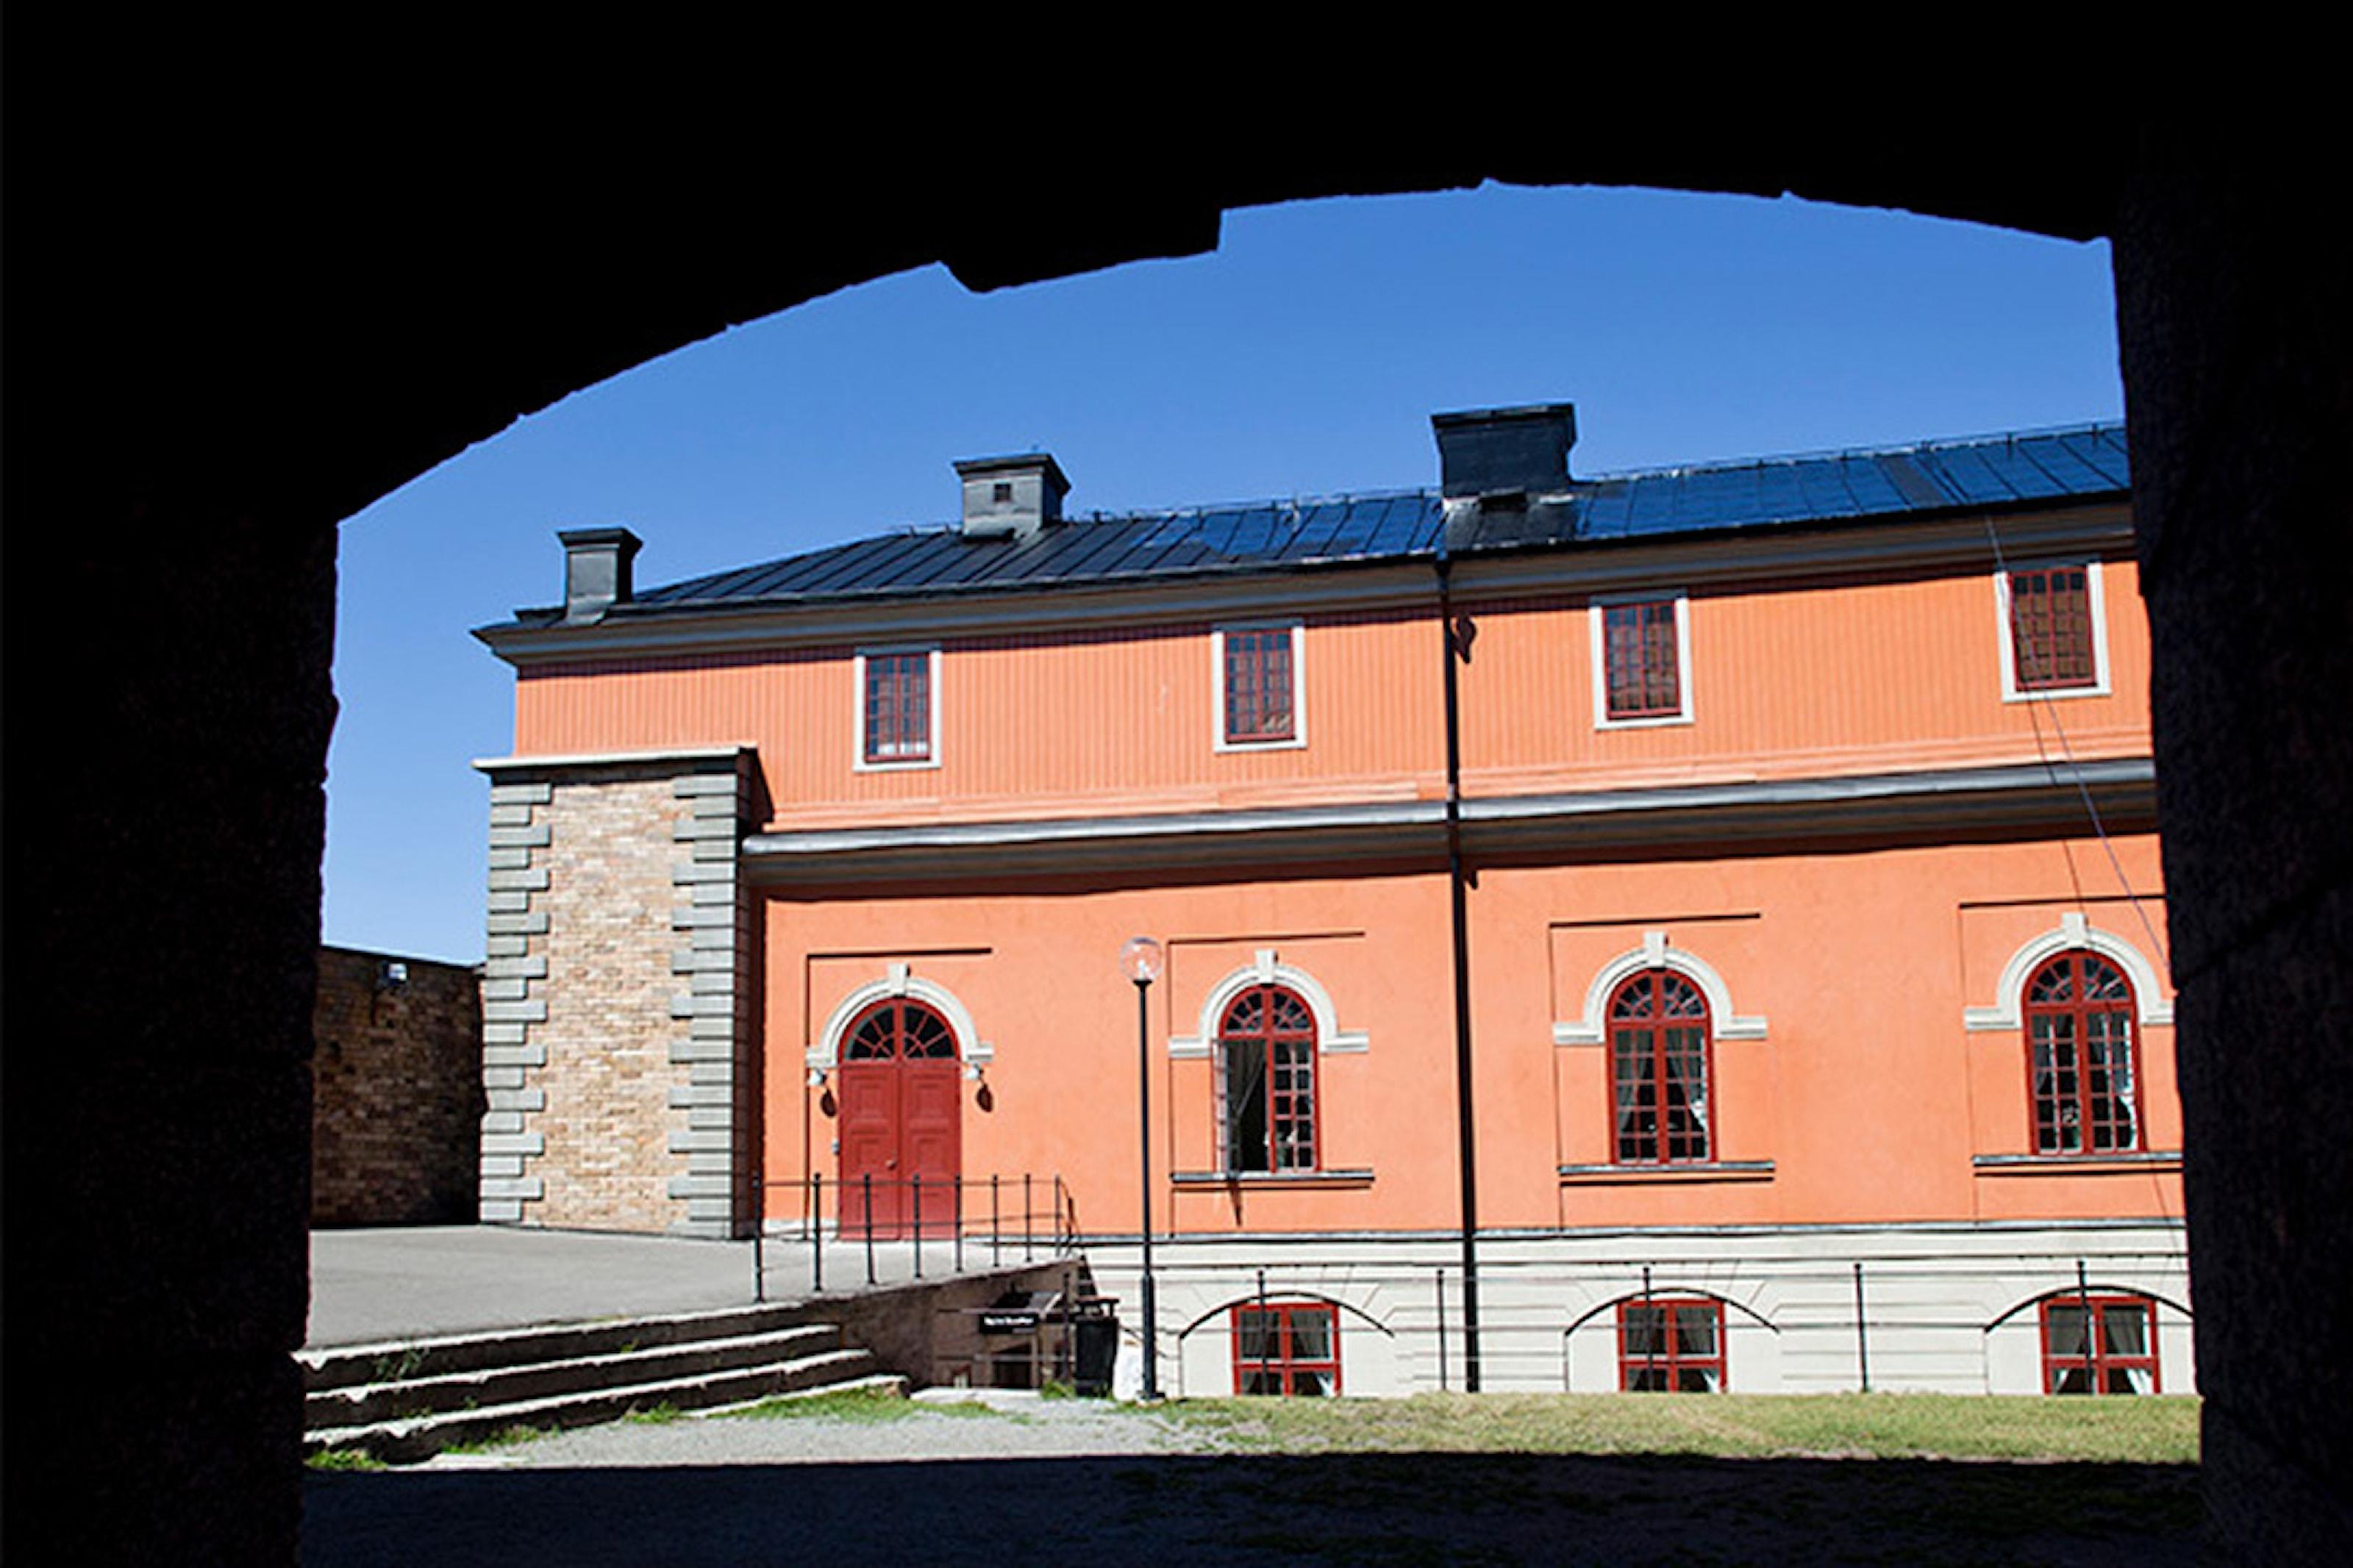 Overnatting på Kastellet Vaxholm for to personer